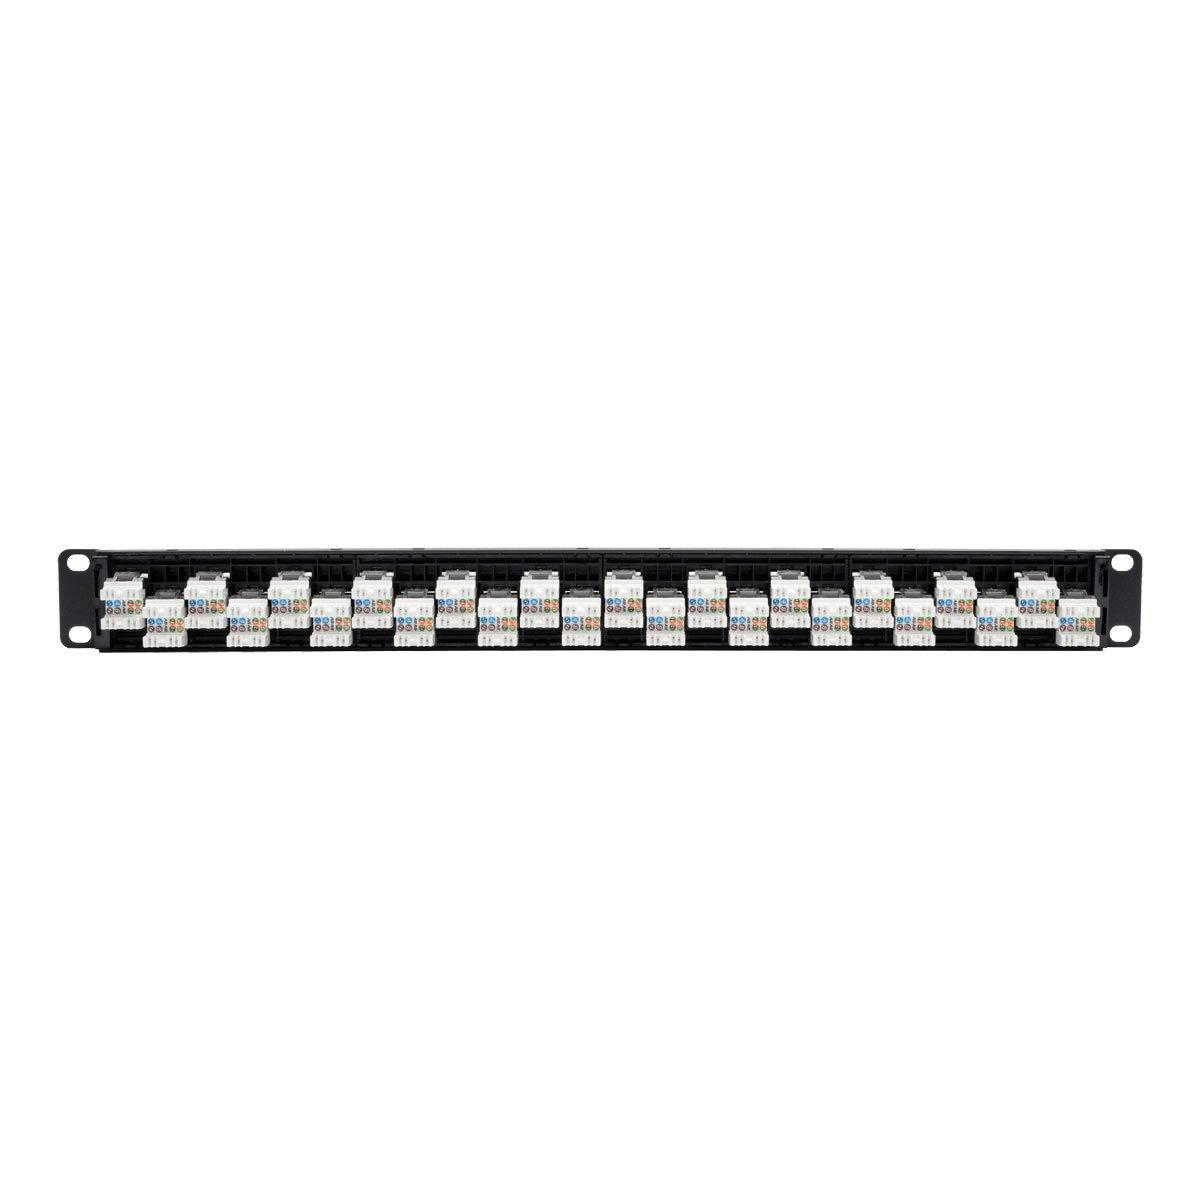 Tripp Lite 48 Port 2u Rackmount Cat6 110 Patch Panel Rj45 Crossover Wiring 568b Ethernetn252 048 Electronics